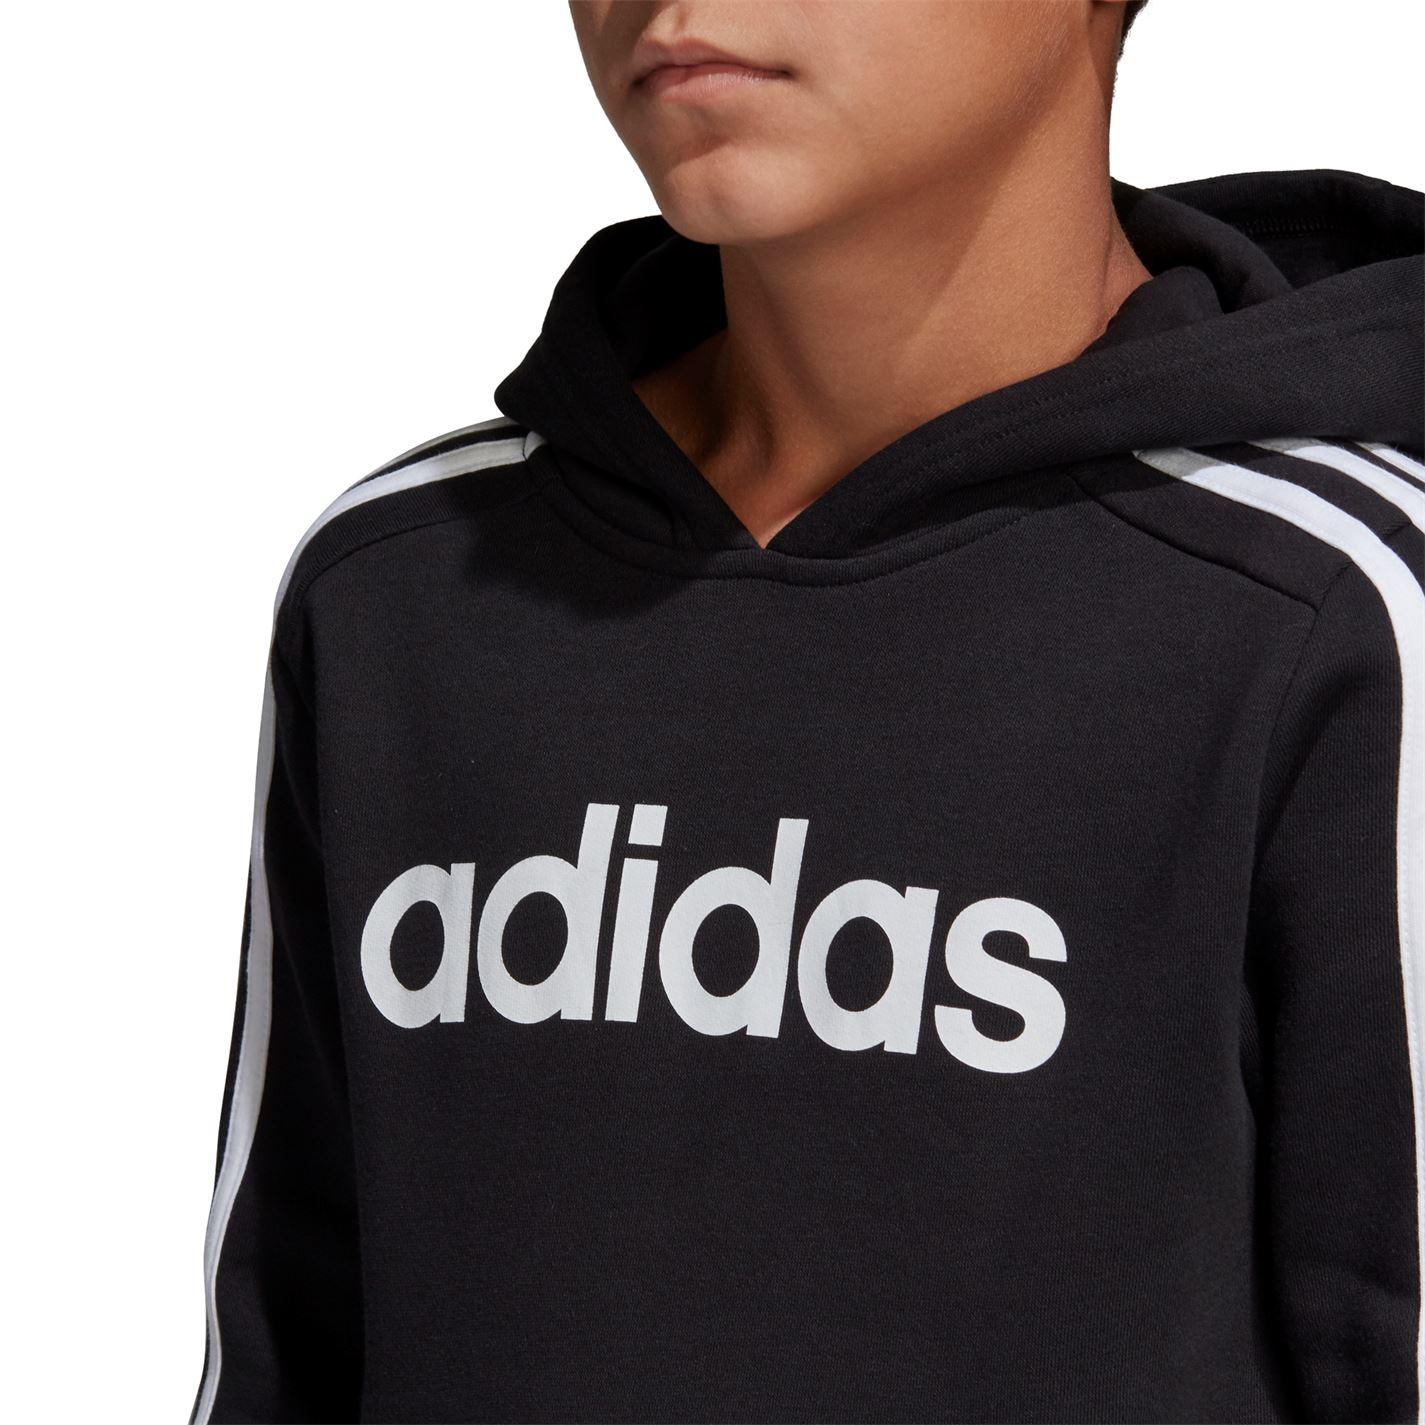 Adidas Boys 3-Stripes Sweatshirt Hoodie